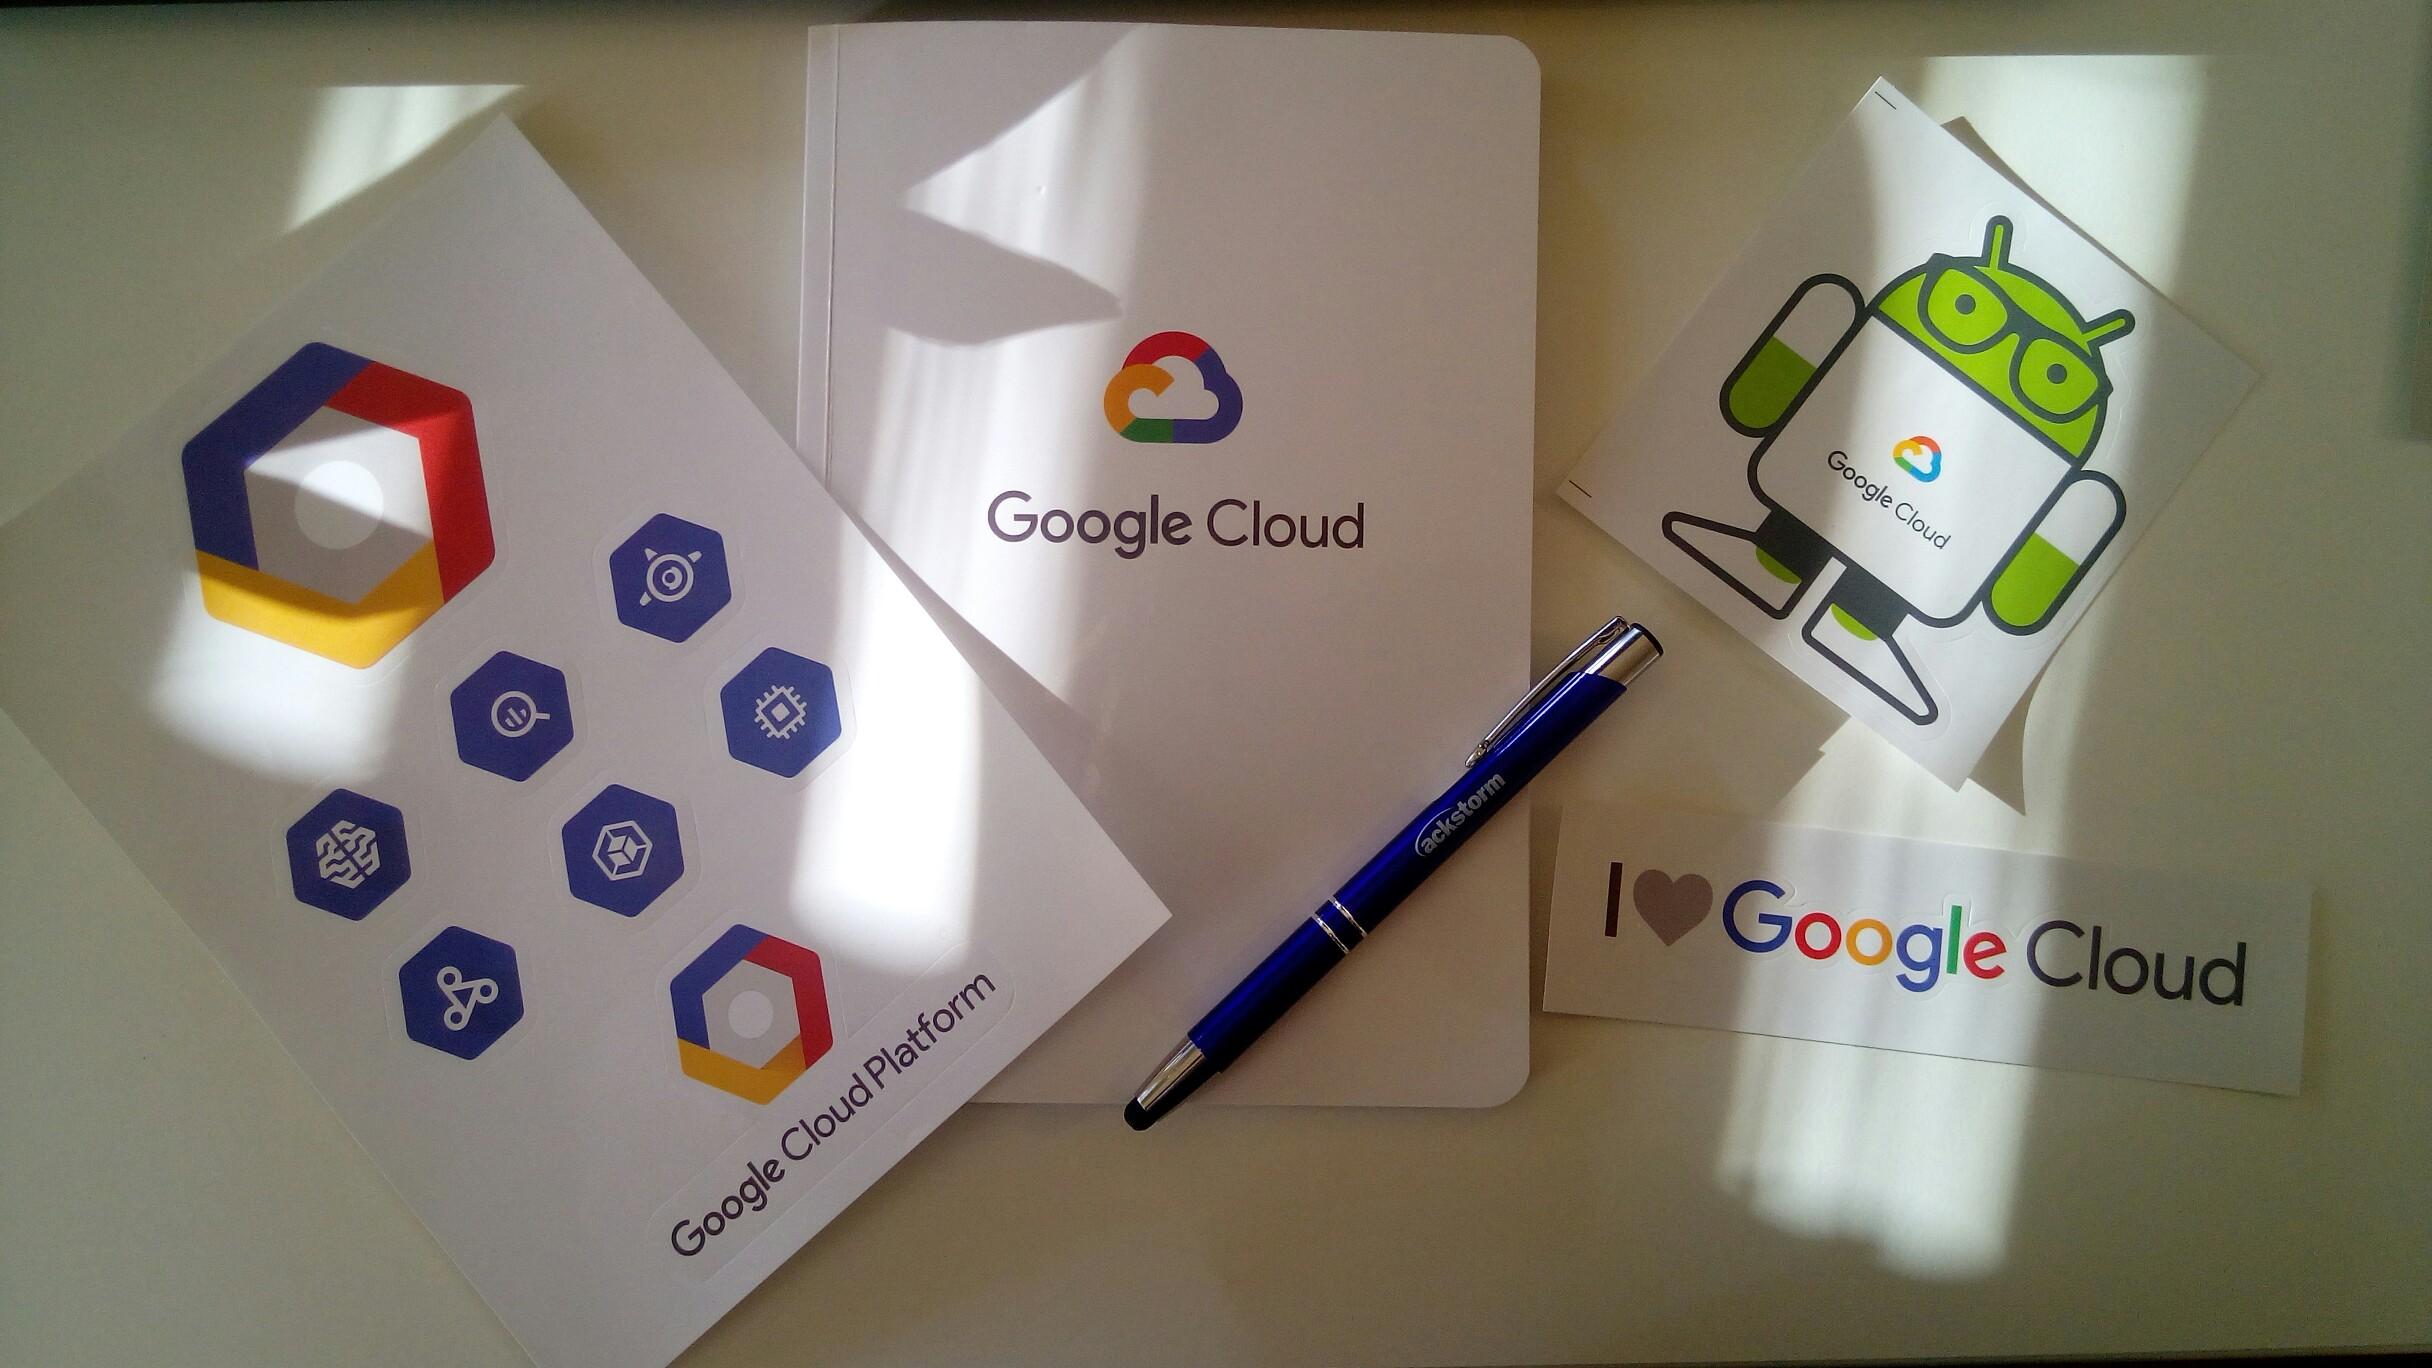 Obsequios del Google Cloud OnBoard recibidos en BaseTIS.